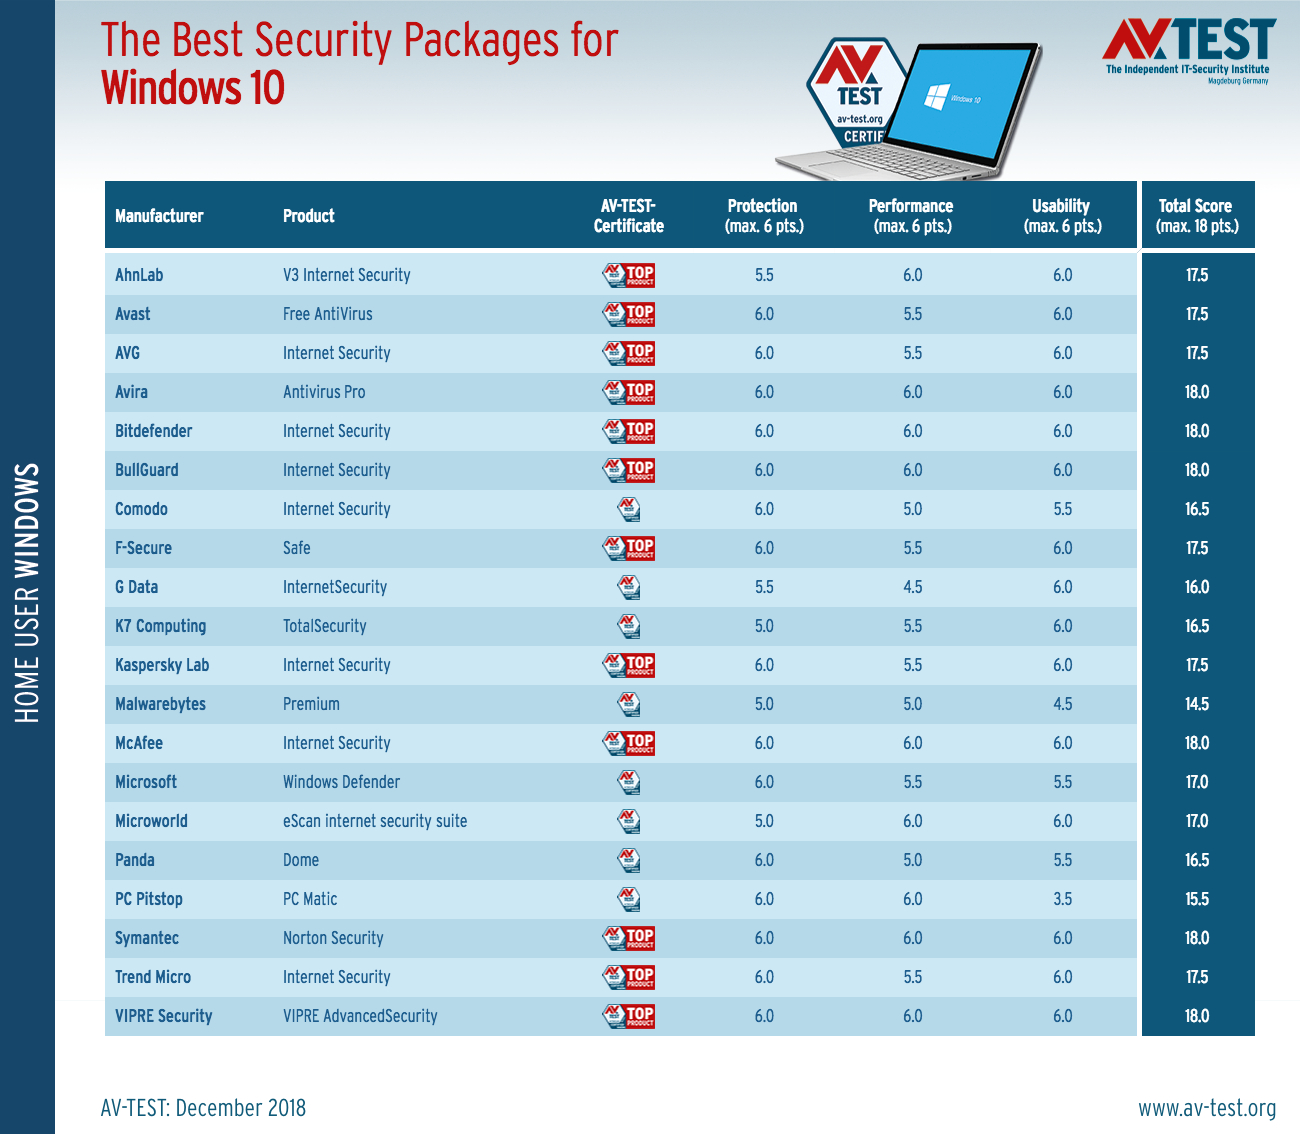 AV-TEST公布最新Win10安全软件产品排名的照片 - 3